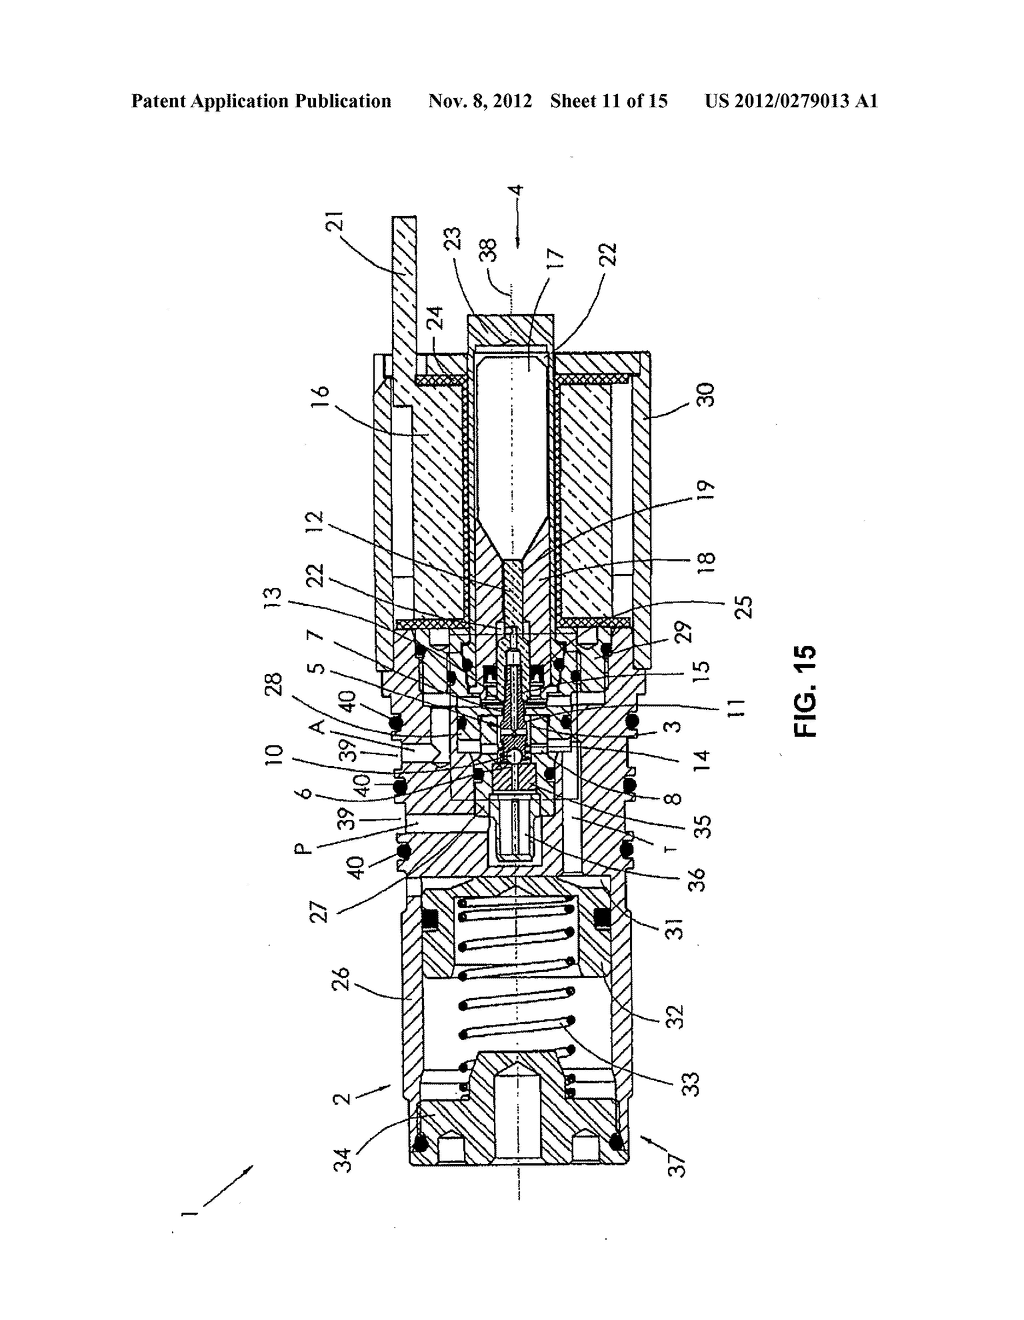 Hydraulic Directional Solenoid Valve And Door Closer Having A Diagram Schematic Image 12